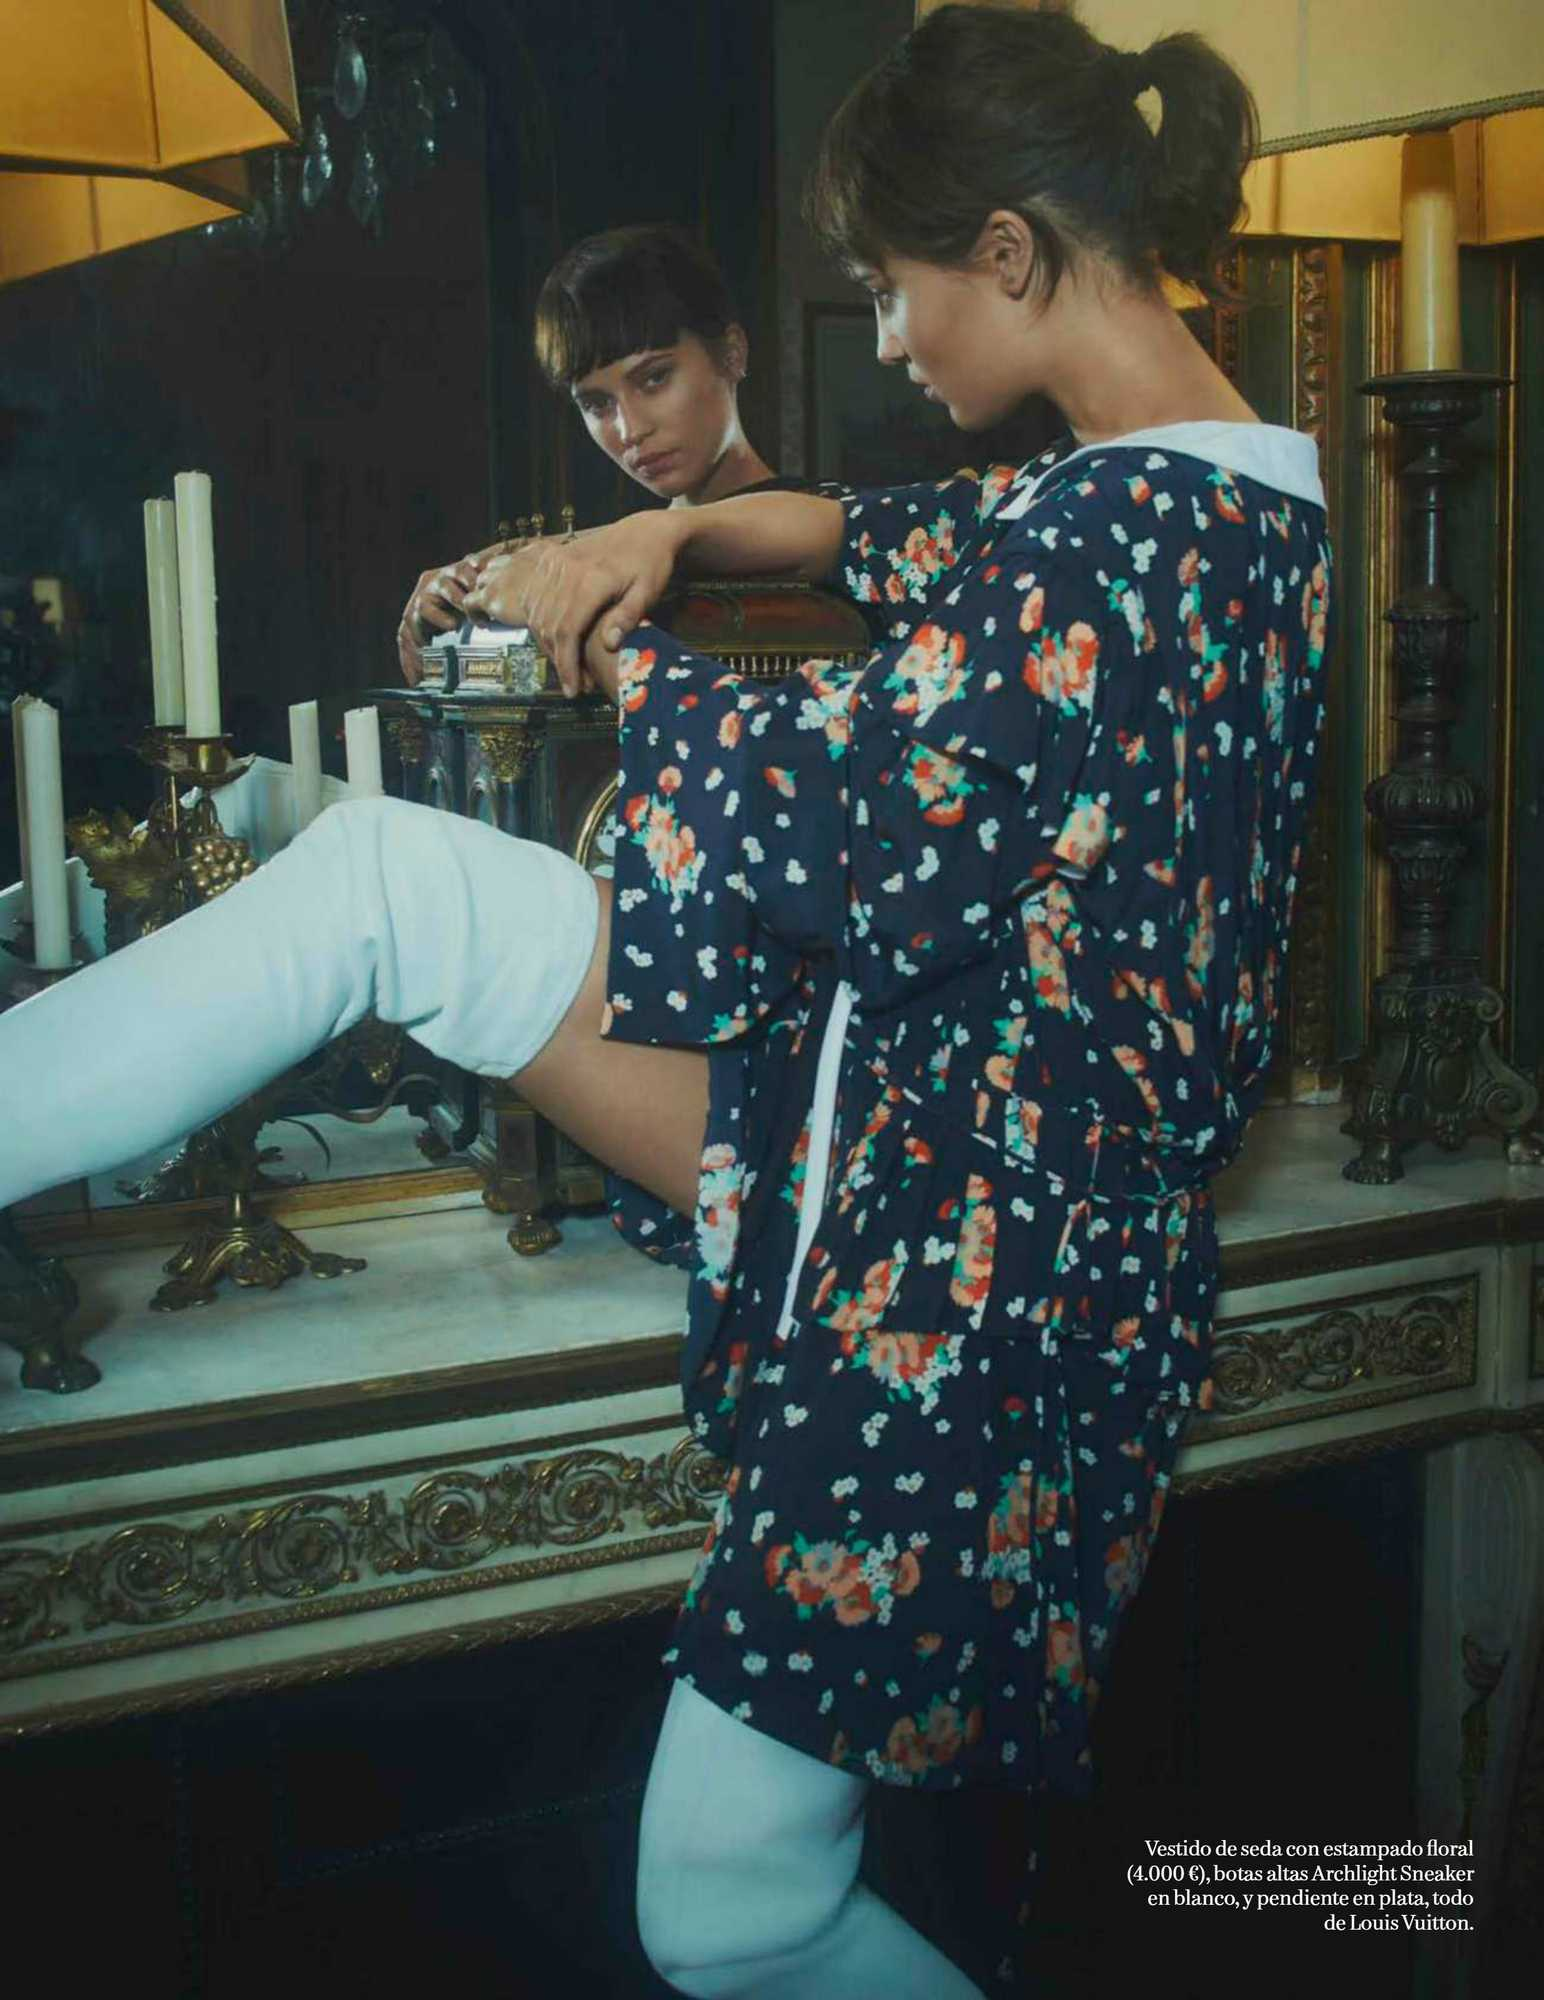 Alicia-Vikander-Vogue-España-December-201811.jpg